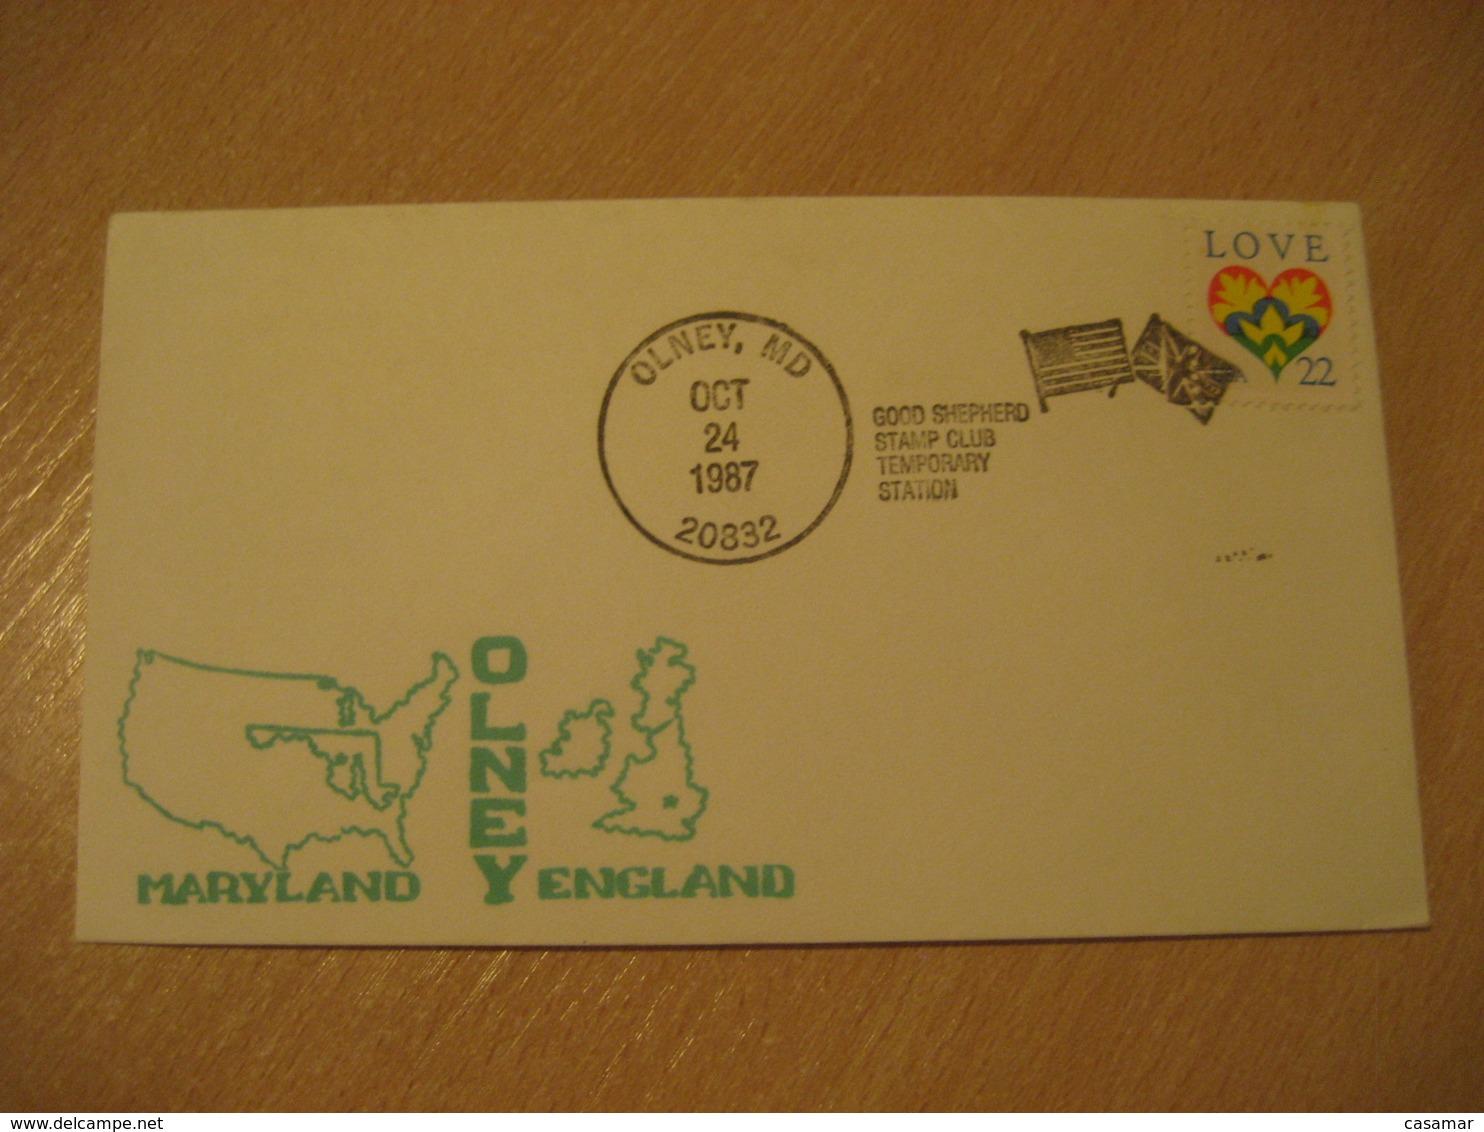 OLNEY 1987 Maryland England Good Shepherd Flag Flags Cancel Cover USA - Briefe